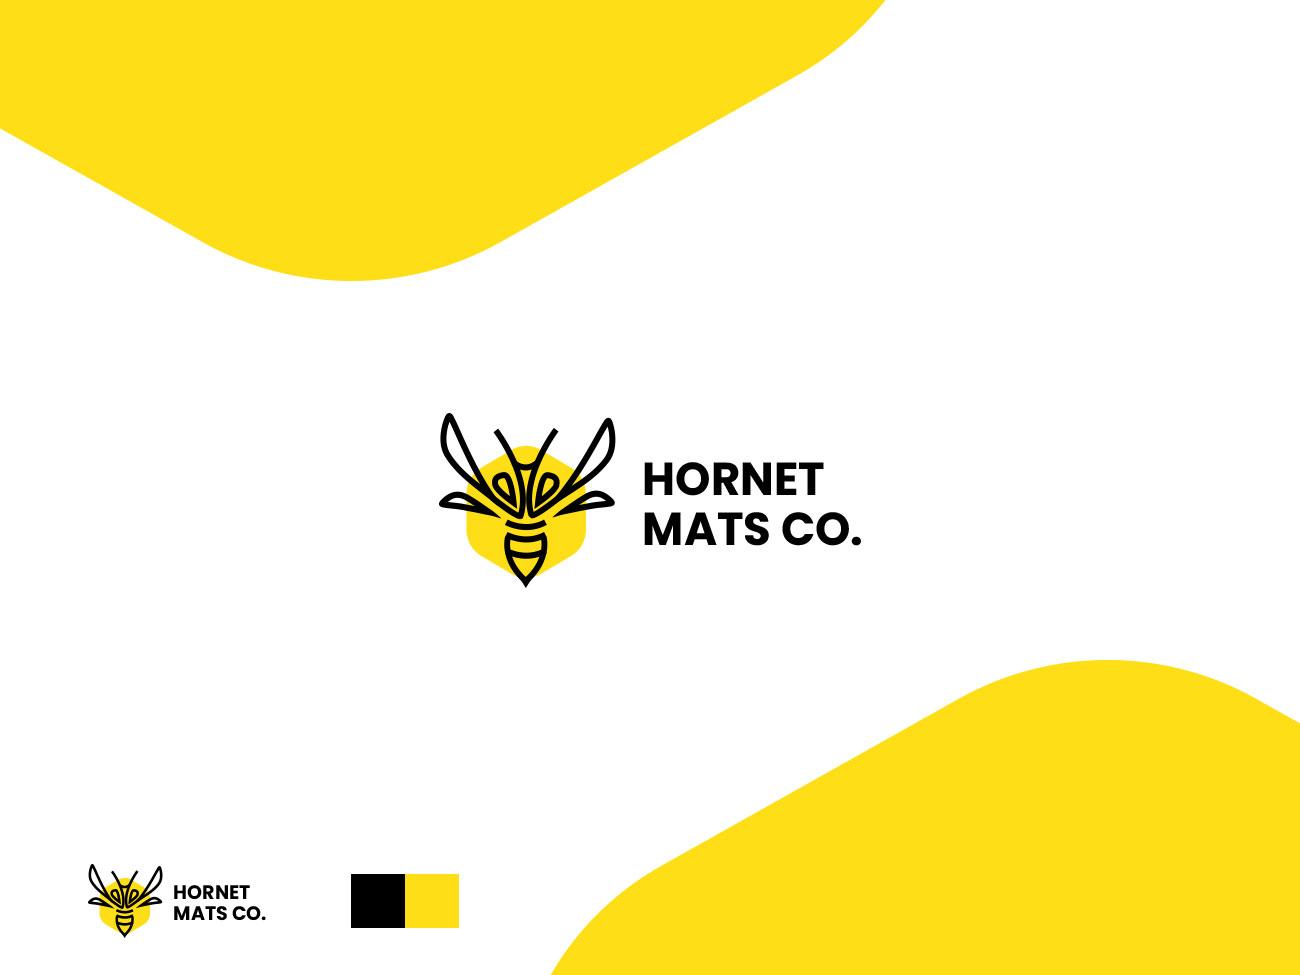 Hornet Mats logo type app designer typography web creativeadobe ui graphic design brand ux design inspiration logo brand icon branding vector illustration color graphic creative design